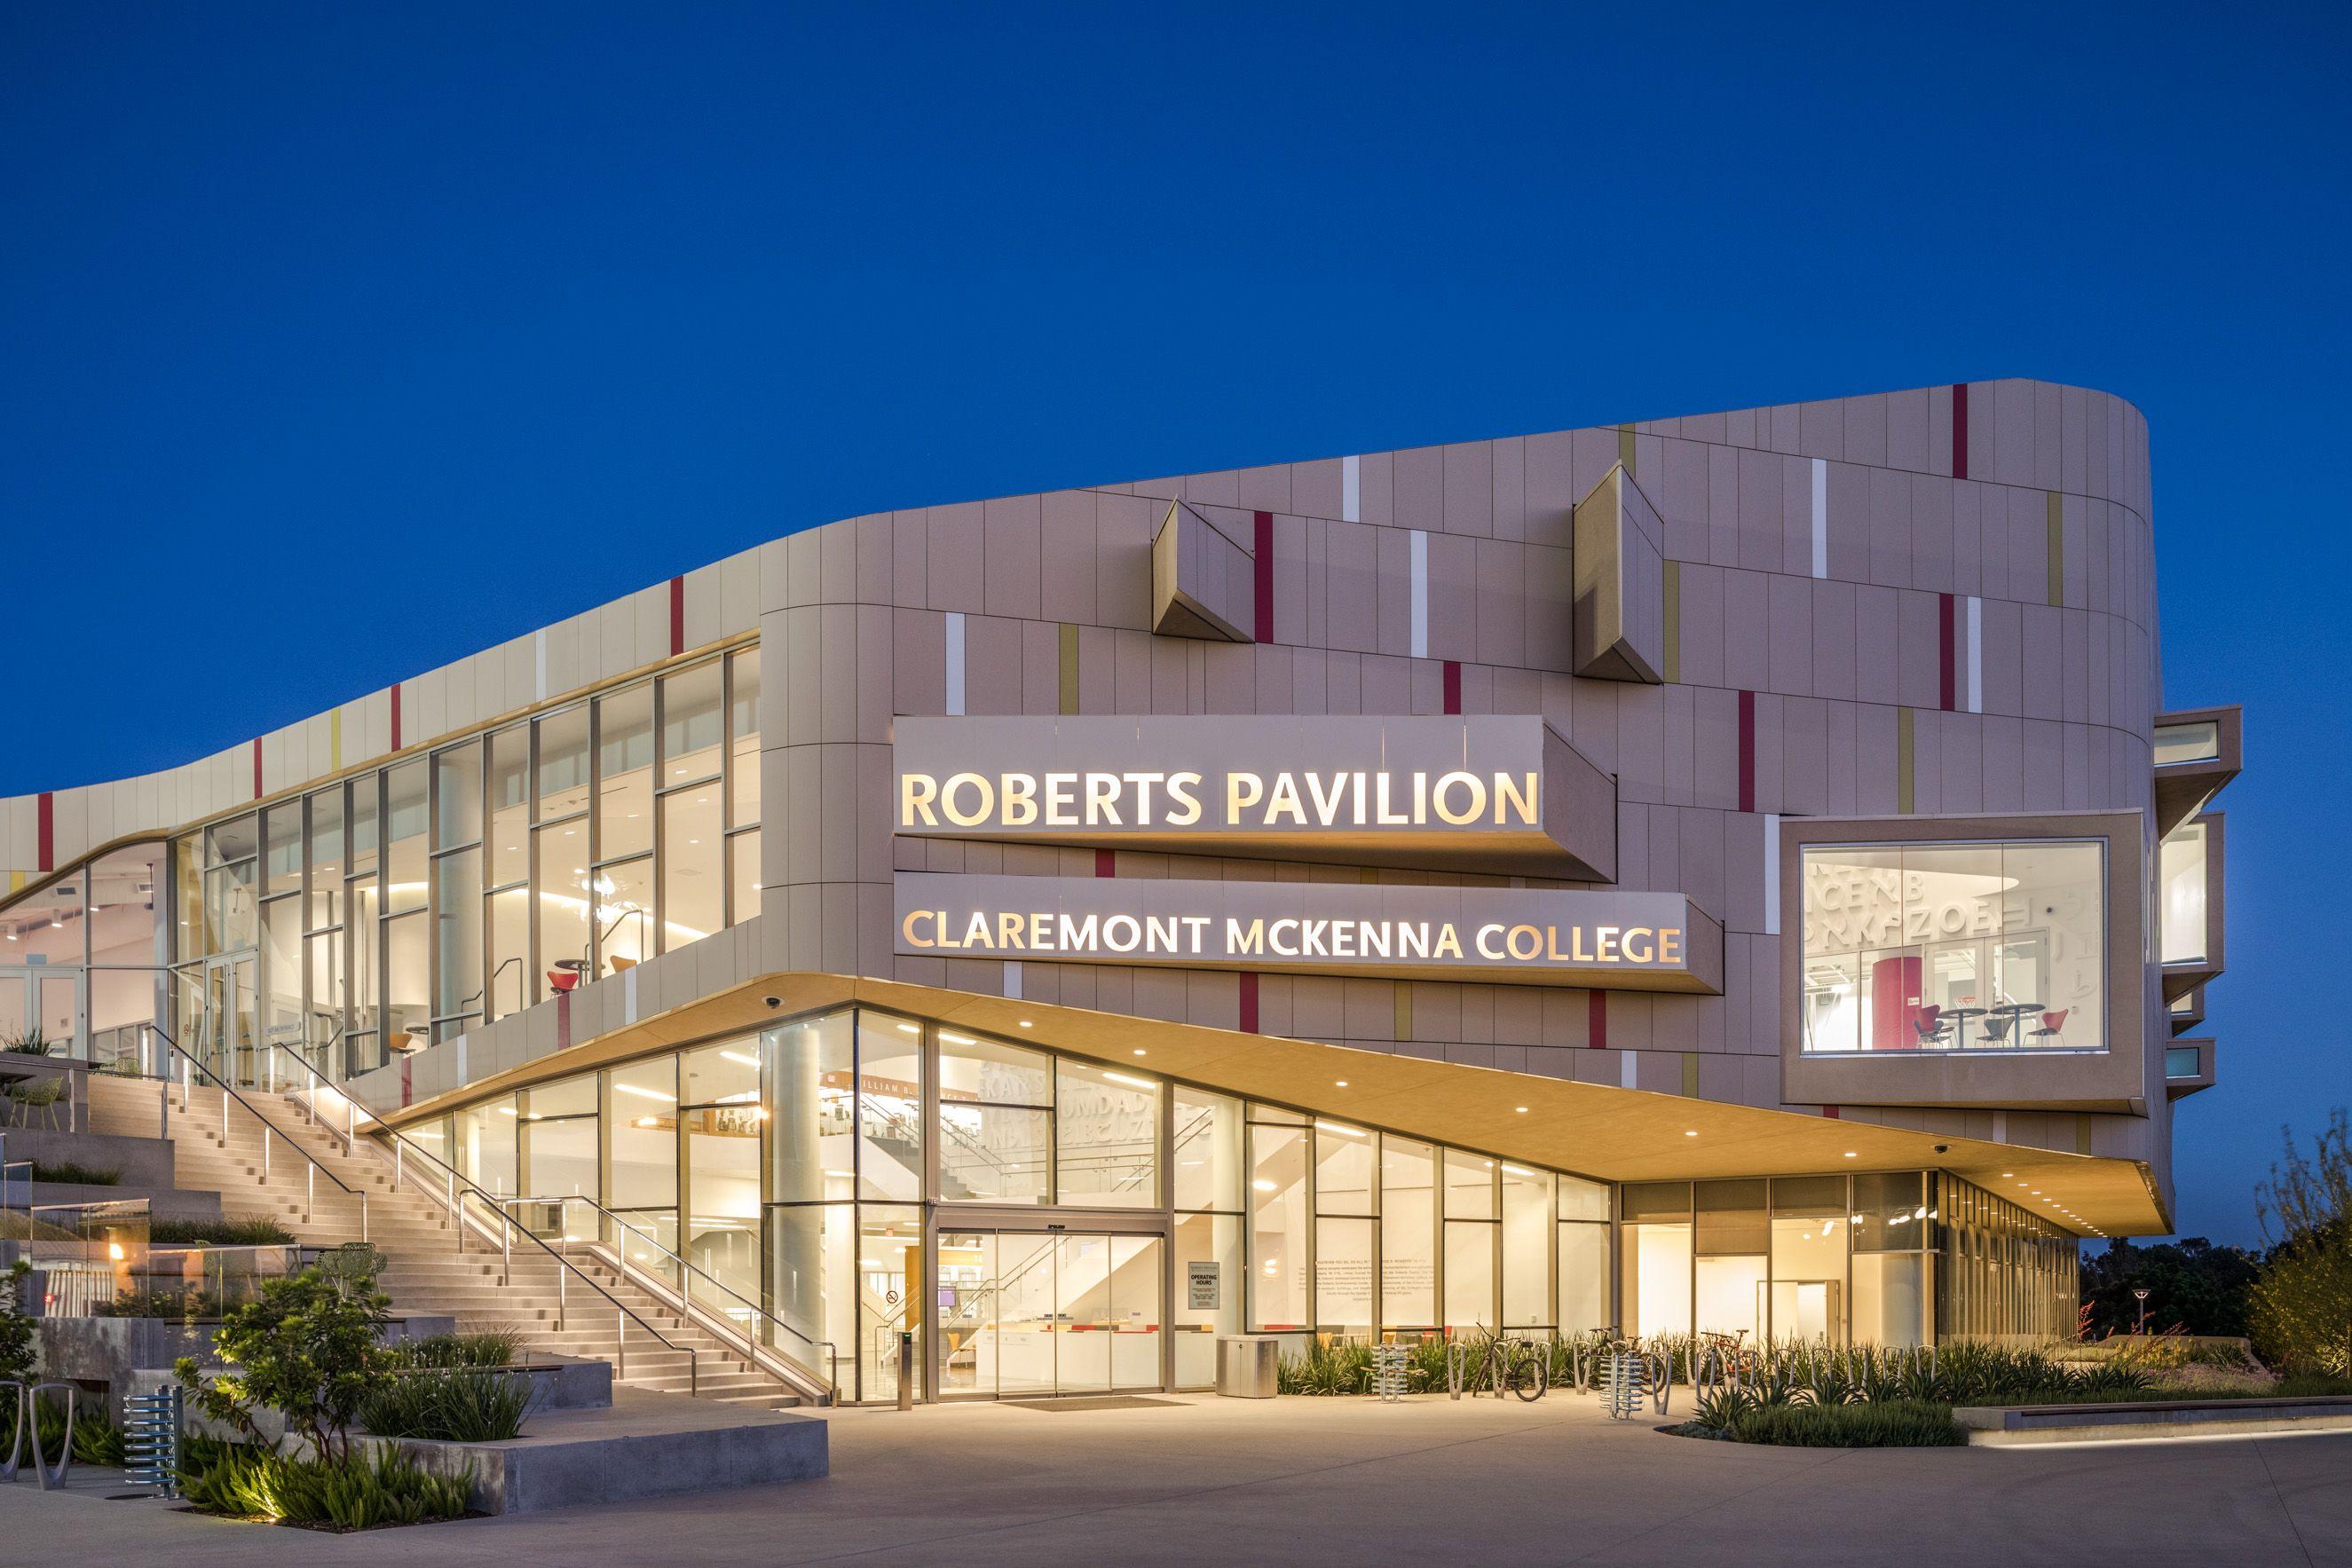 Roberts Pavilion